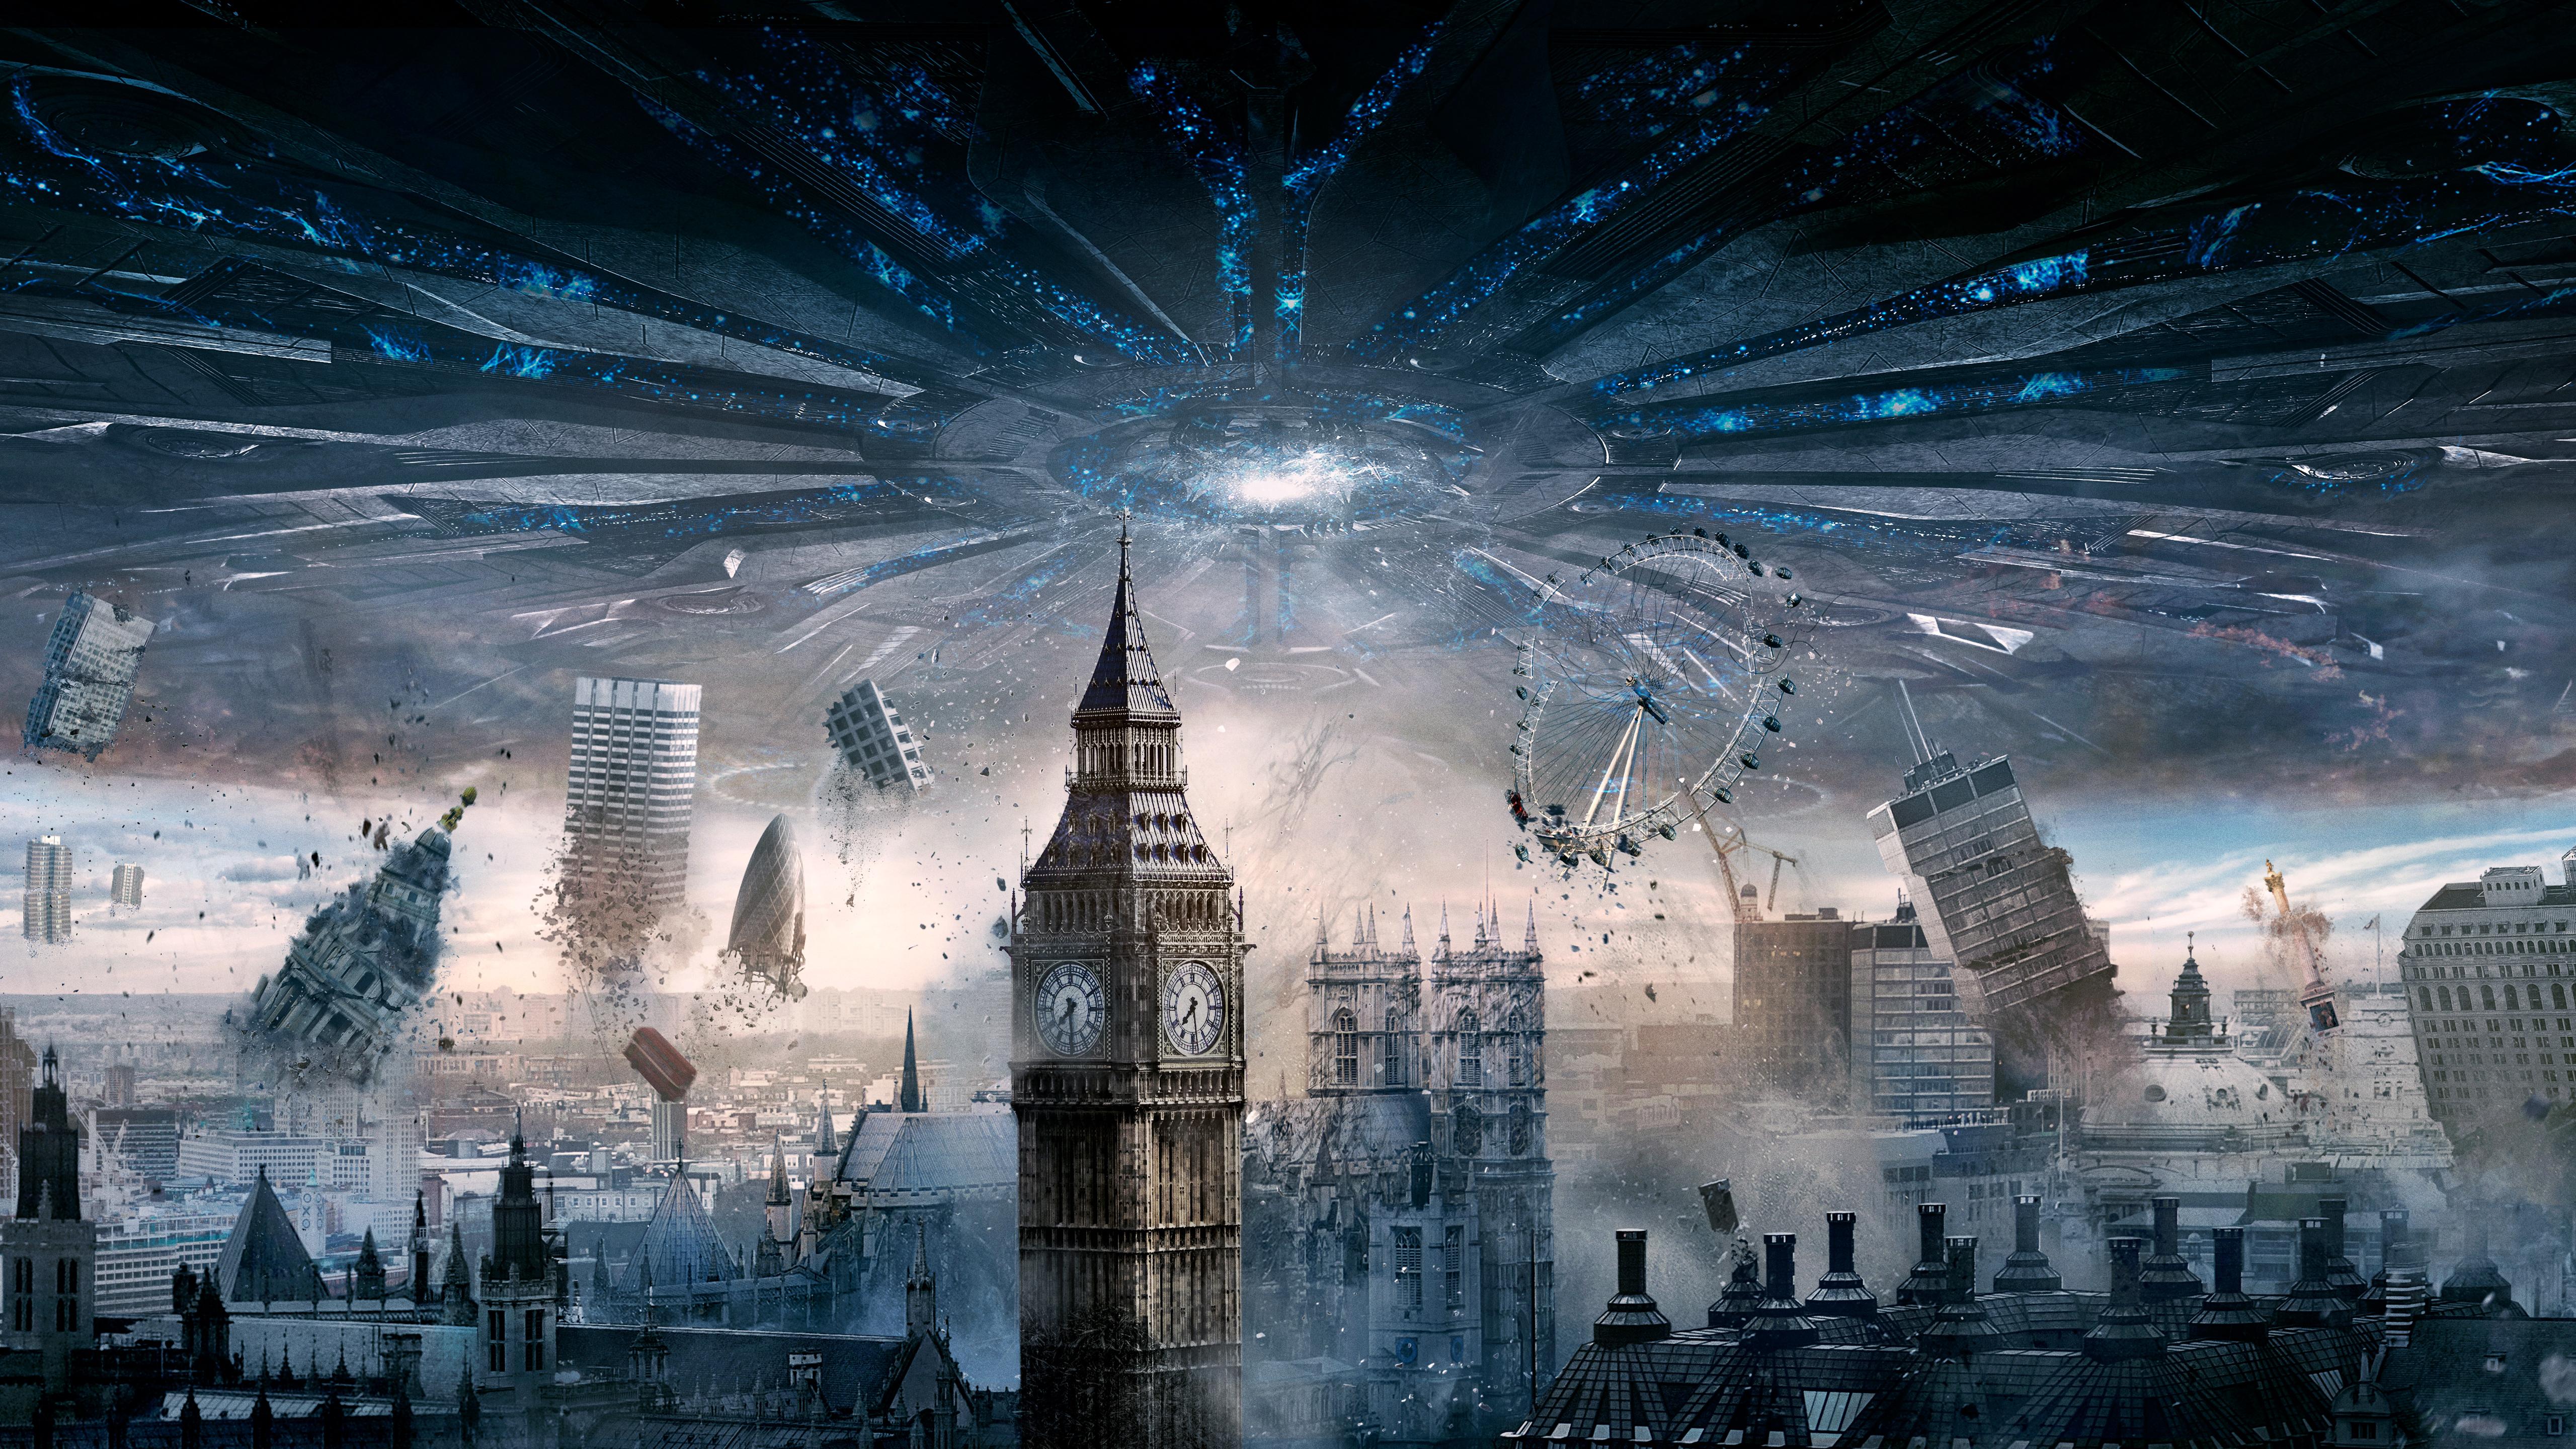 London Independence Day Resurgence 4K wallpaper 5120x2880